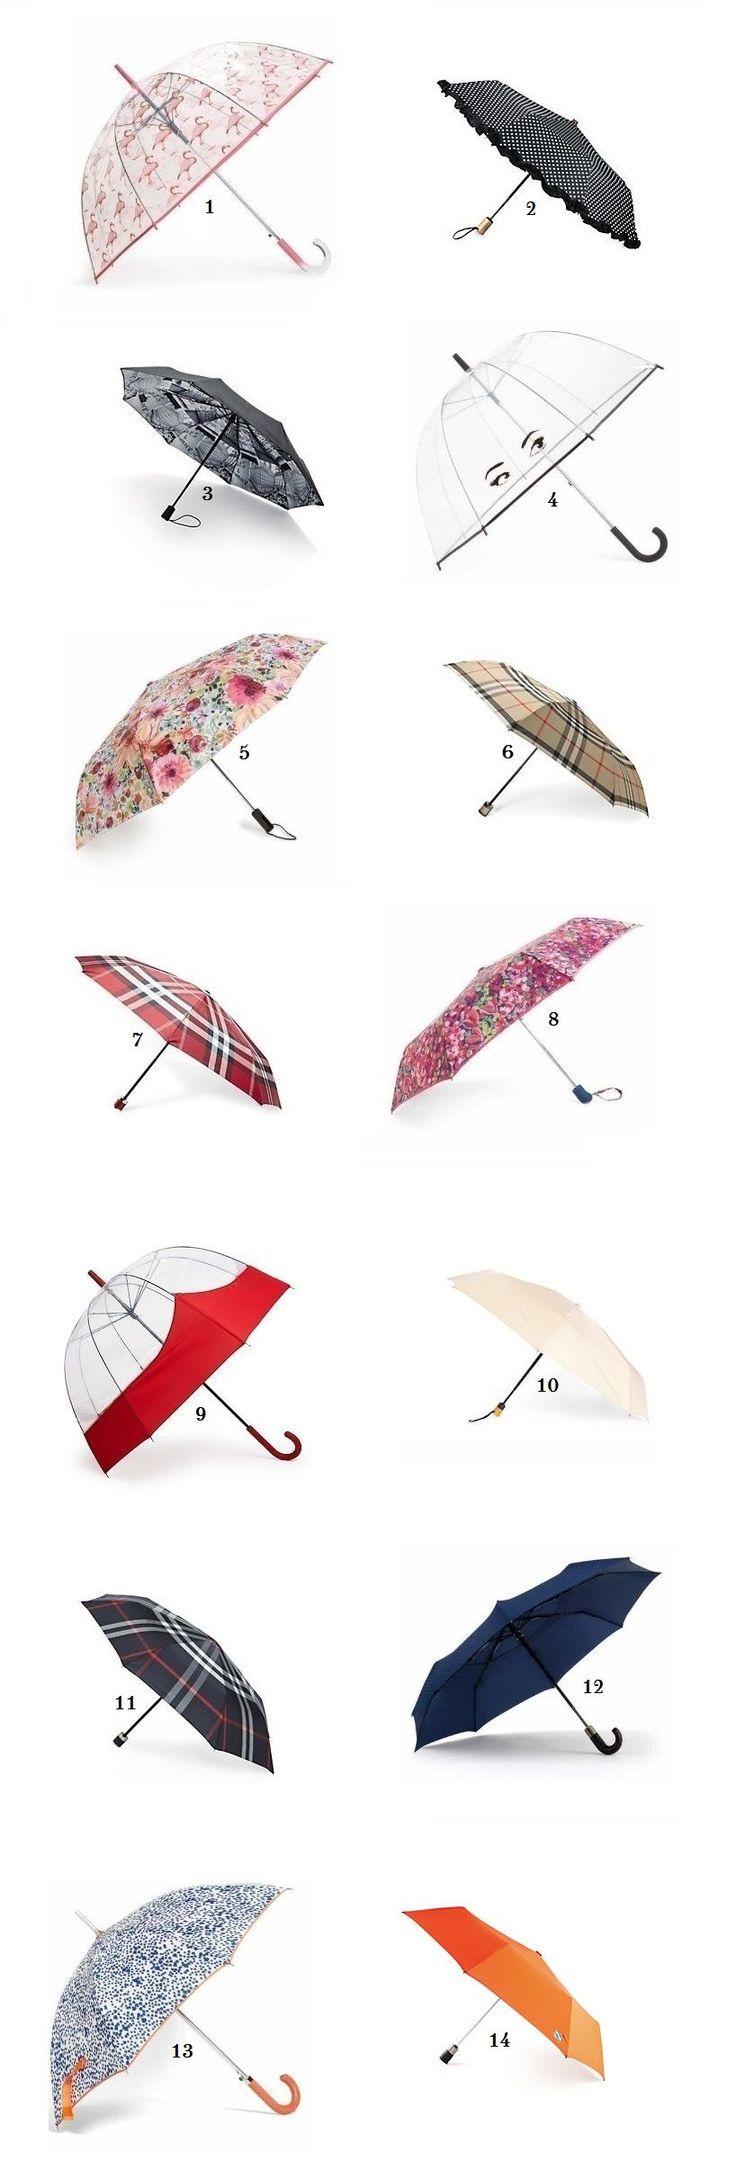 April Showers Chic! This season's best umbrellas